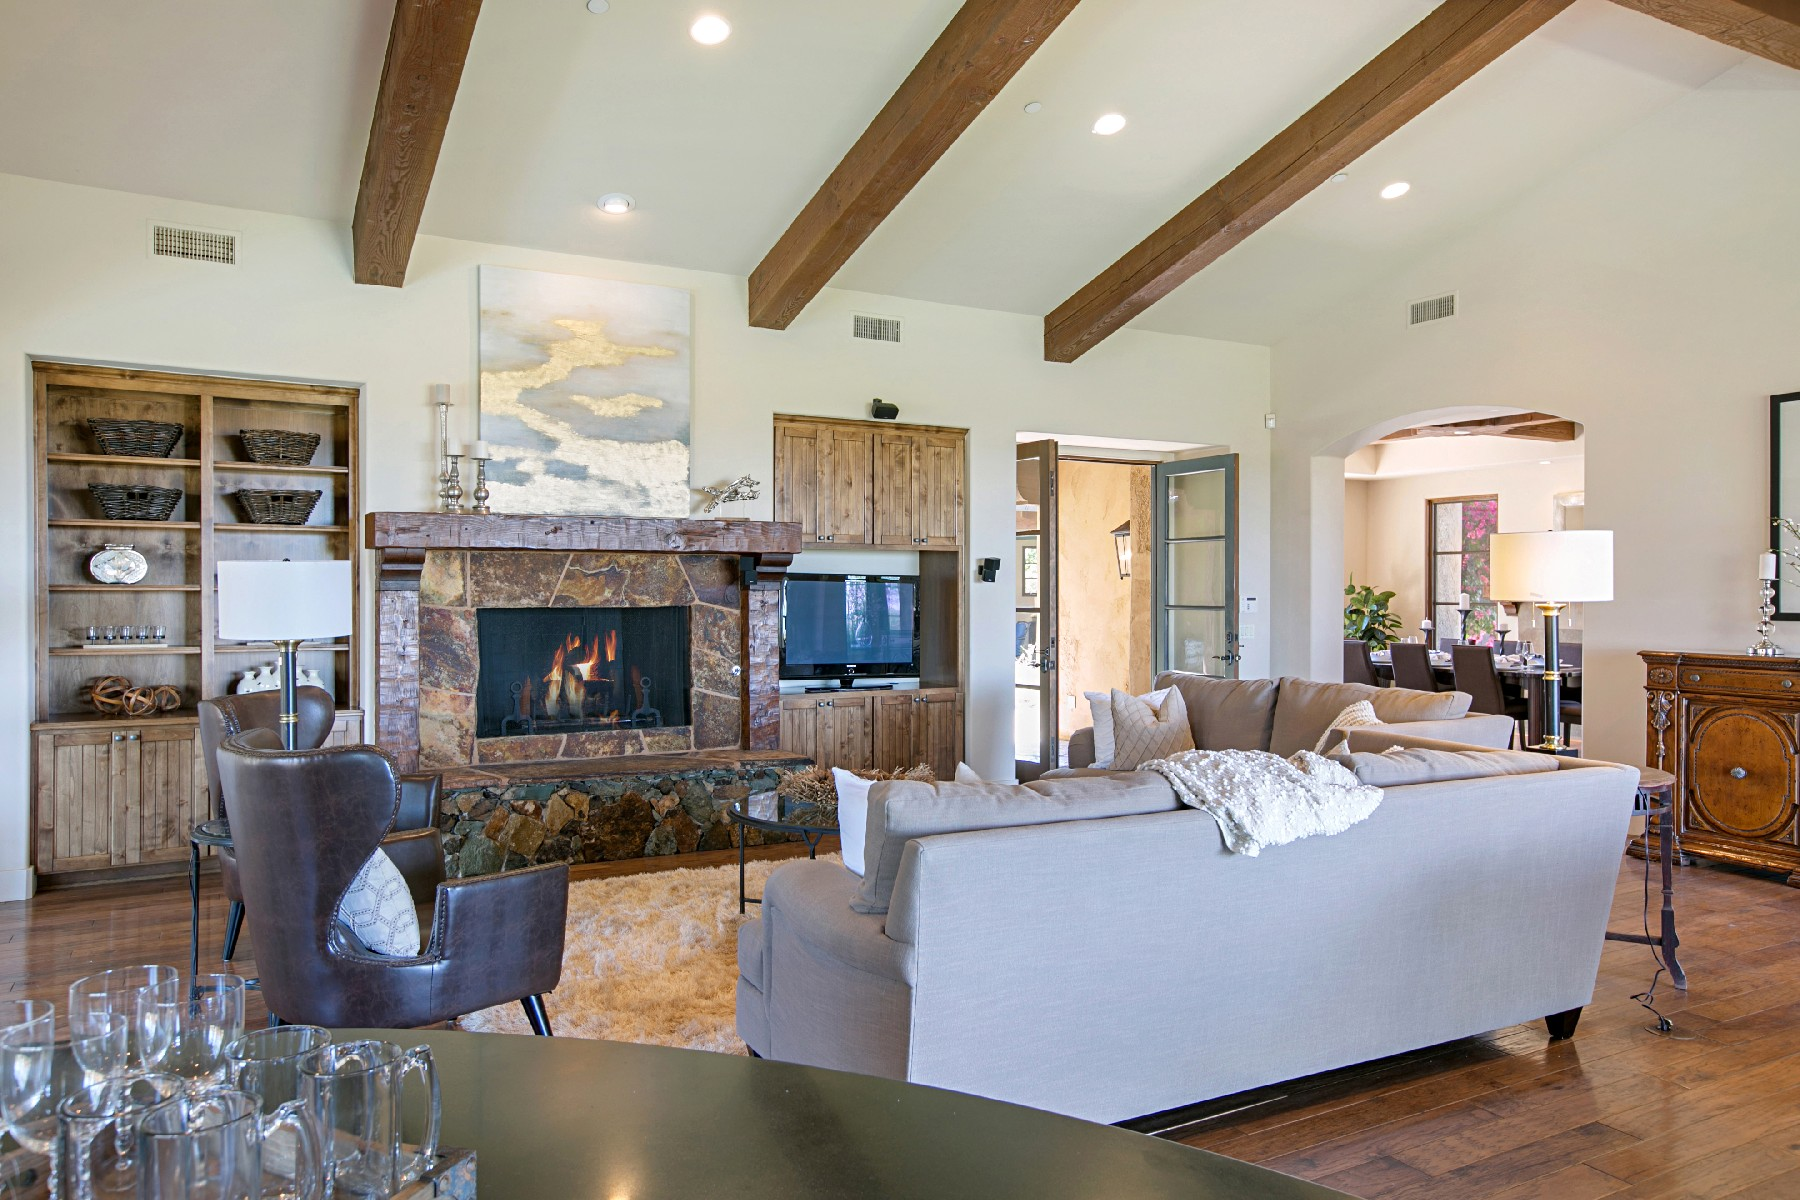 Additional photo for property listing at 6910 The Preserve Way  San Diego, California 92130 Estados Unidos